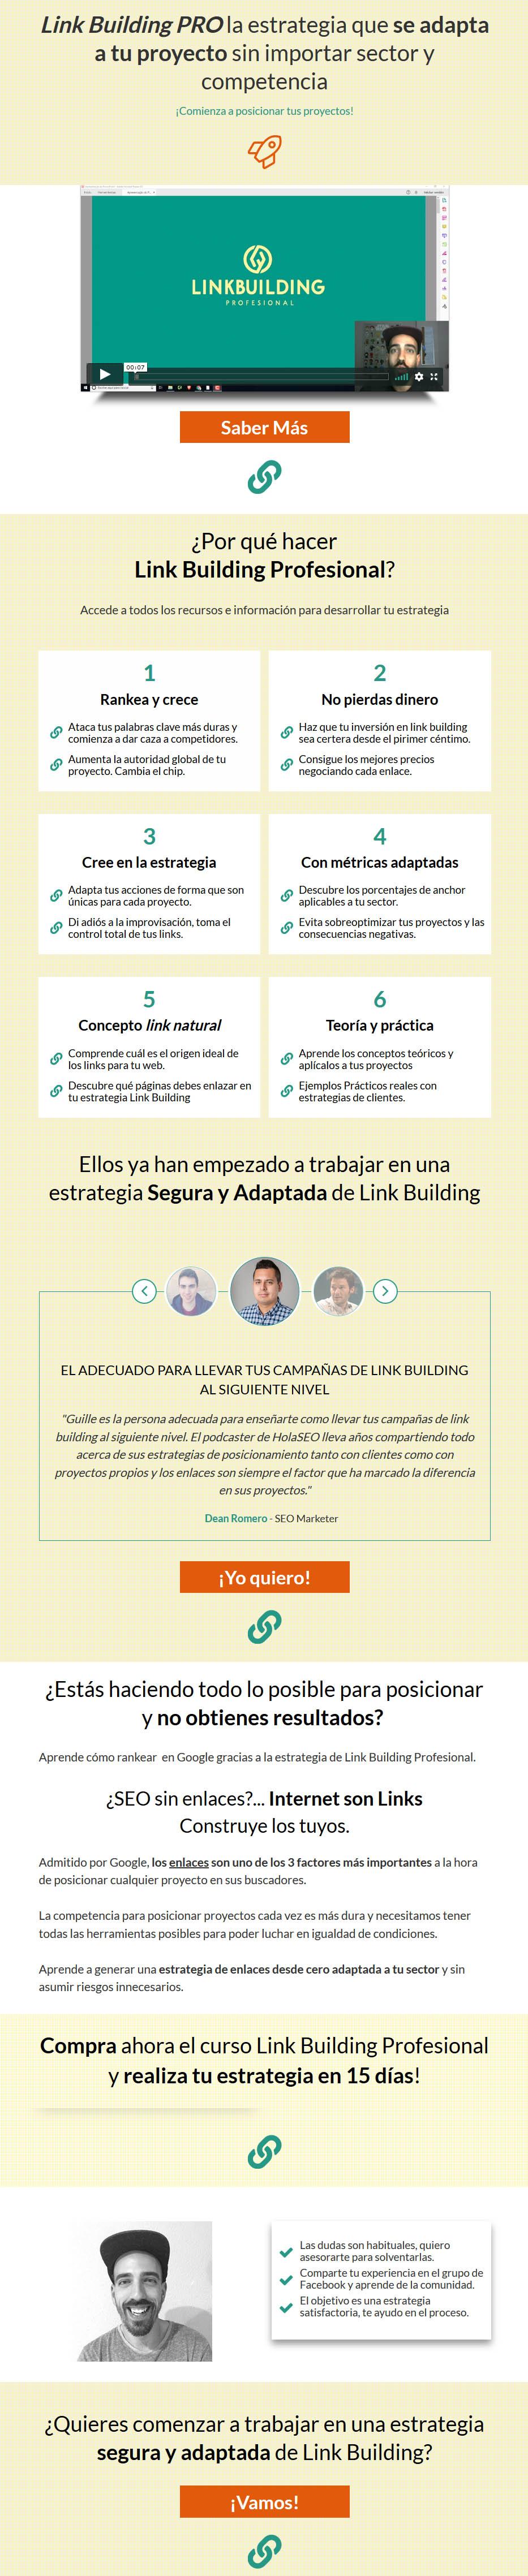 Link Building Pro